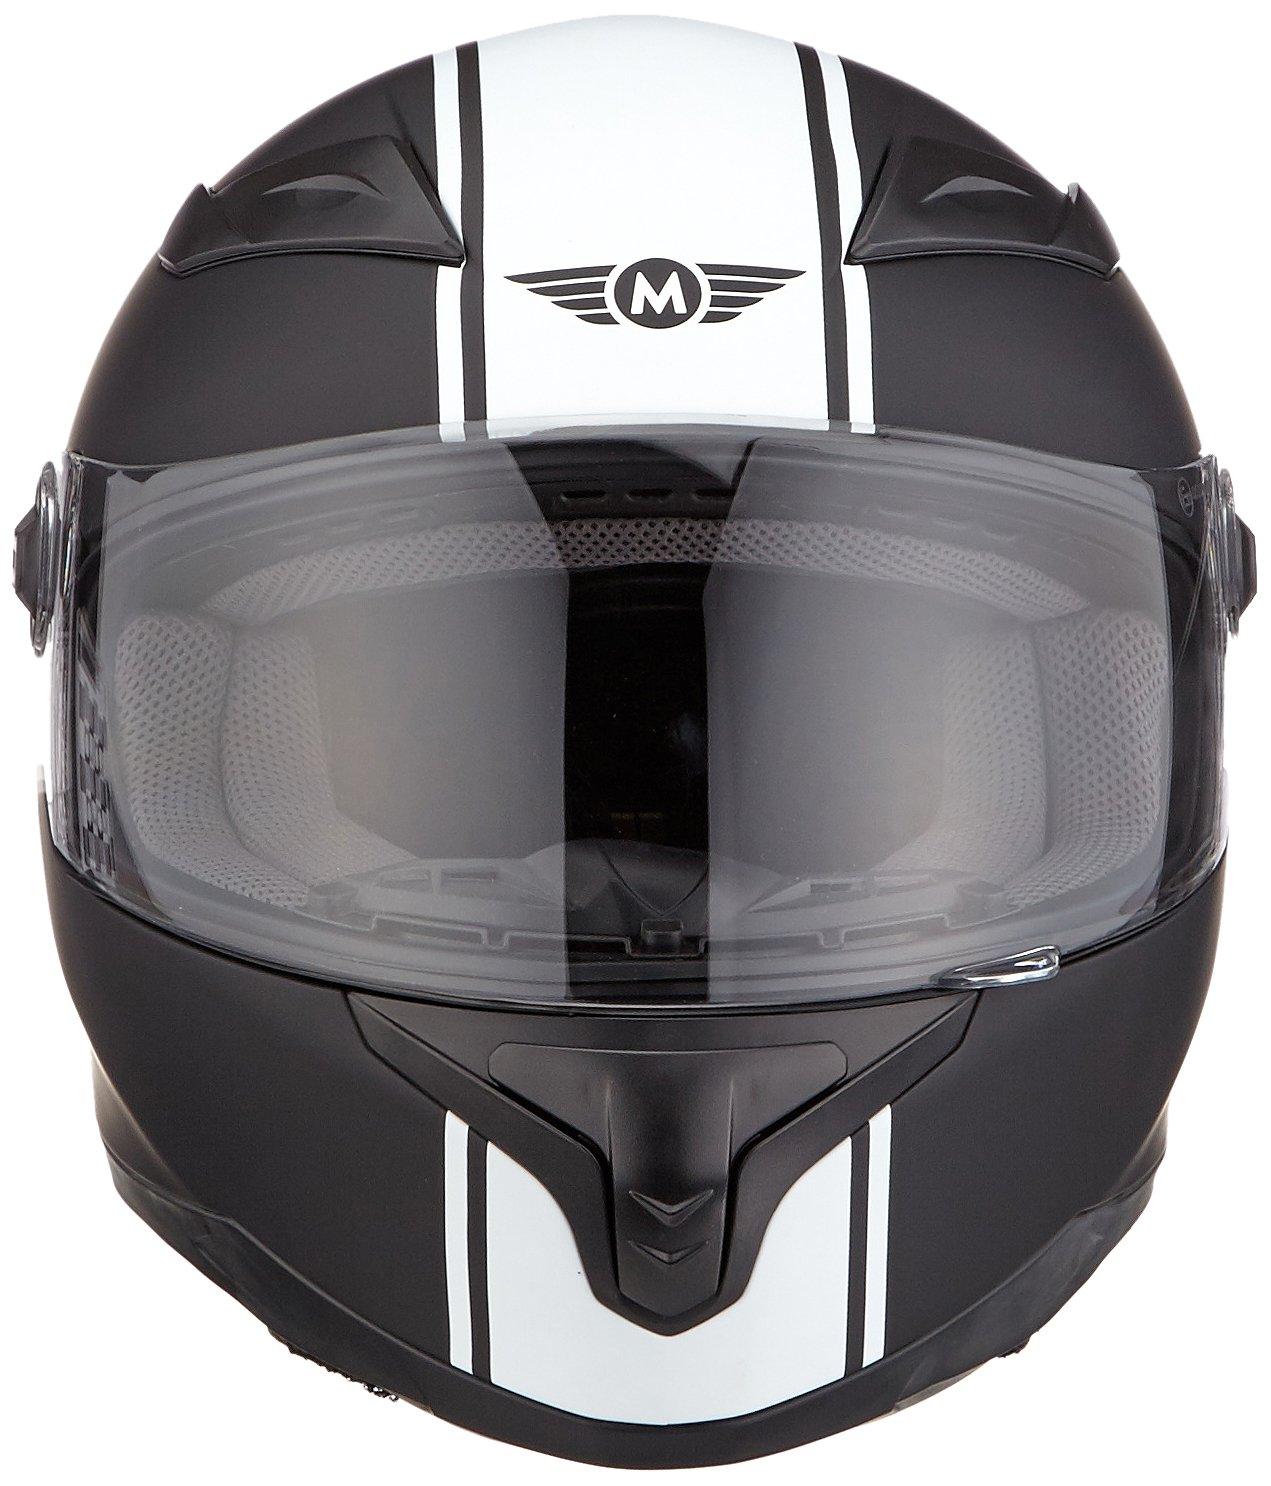 57-58cm MOTO X86 Racing Matt Black /· Fullface-Helmet Urban Urbano Casco Integrale Scooter Moto motocicleta Cruiser Sport /· ECE certificado /· visera incluido /· incluyendo bolsa de casco /· Blanco /· M